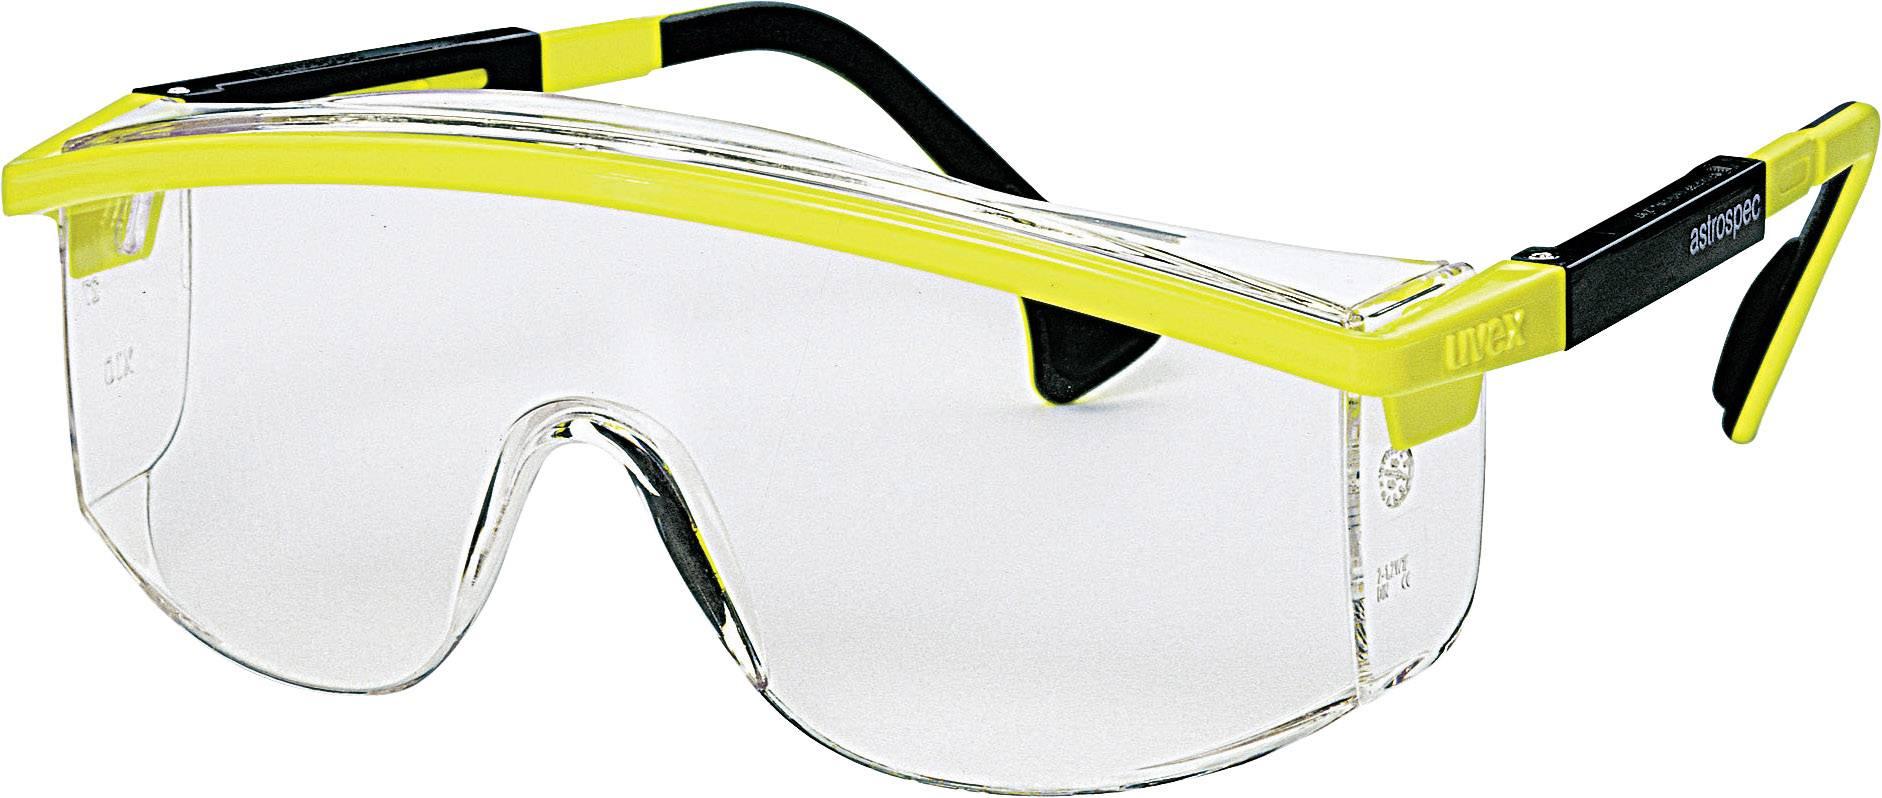 Ochranné okuliare Uvex Astropec 9168035